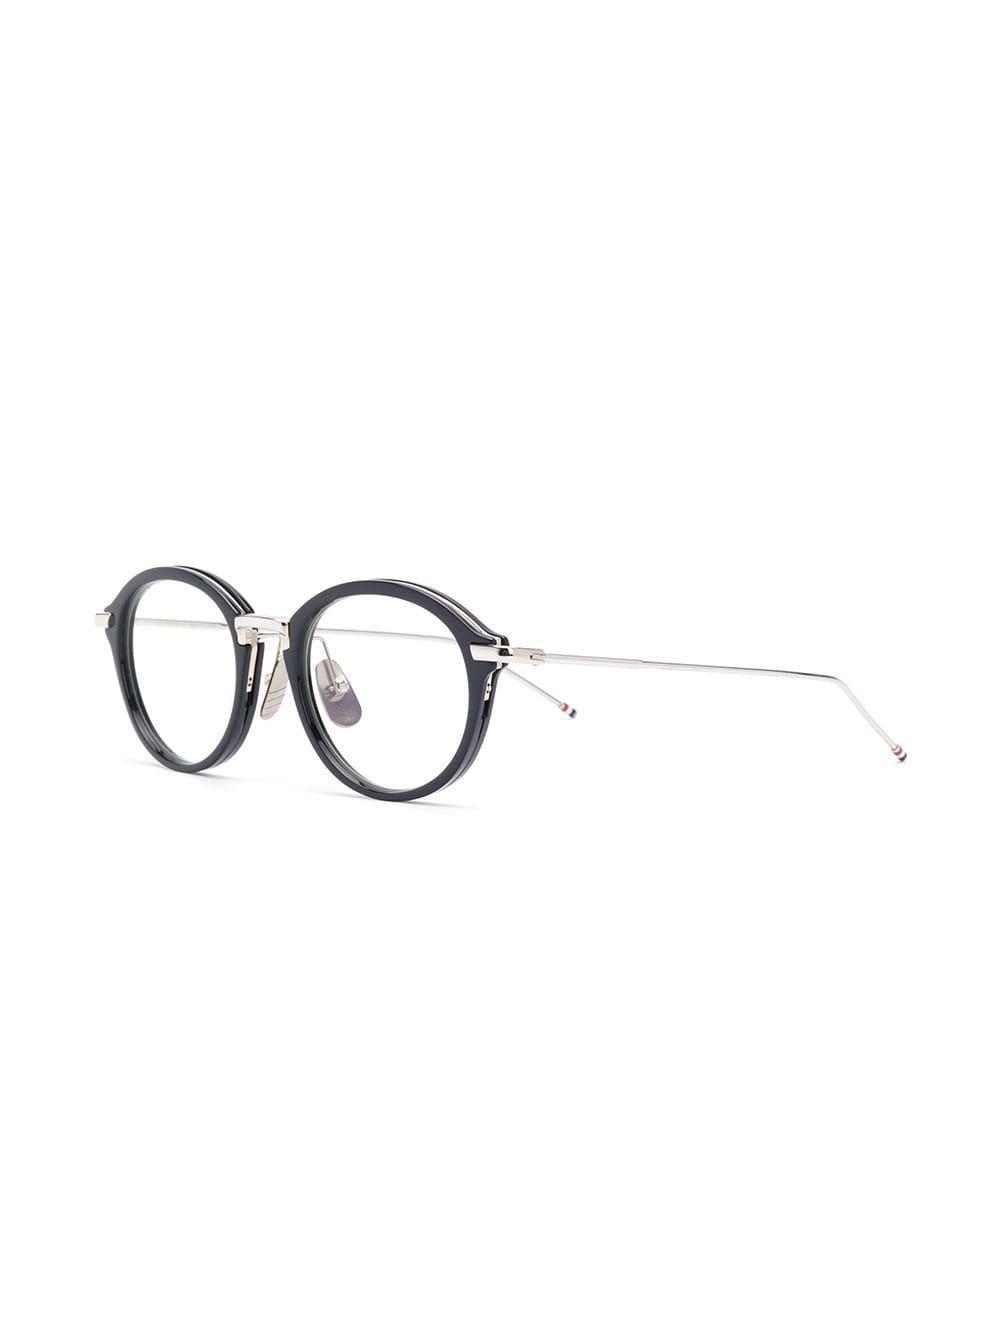 864fcbabeedf Thom Browne - Blue Round Frame Glasses - Lyst. View fullscreen